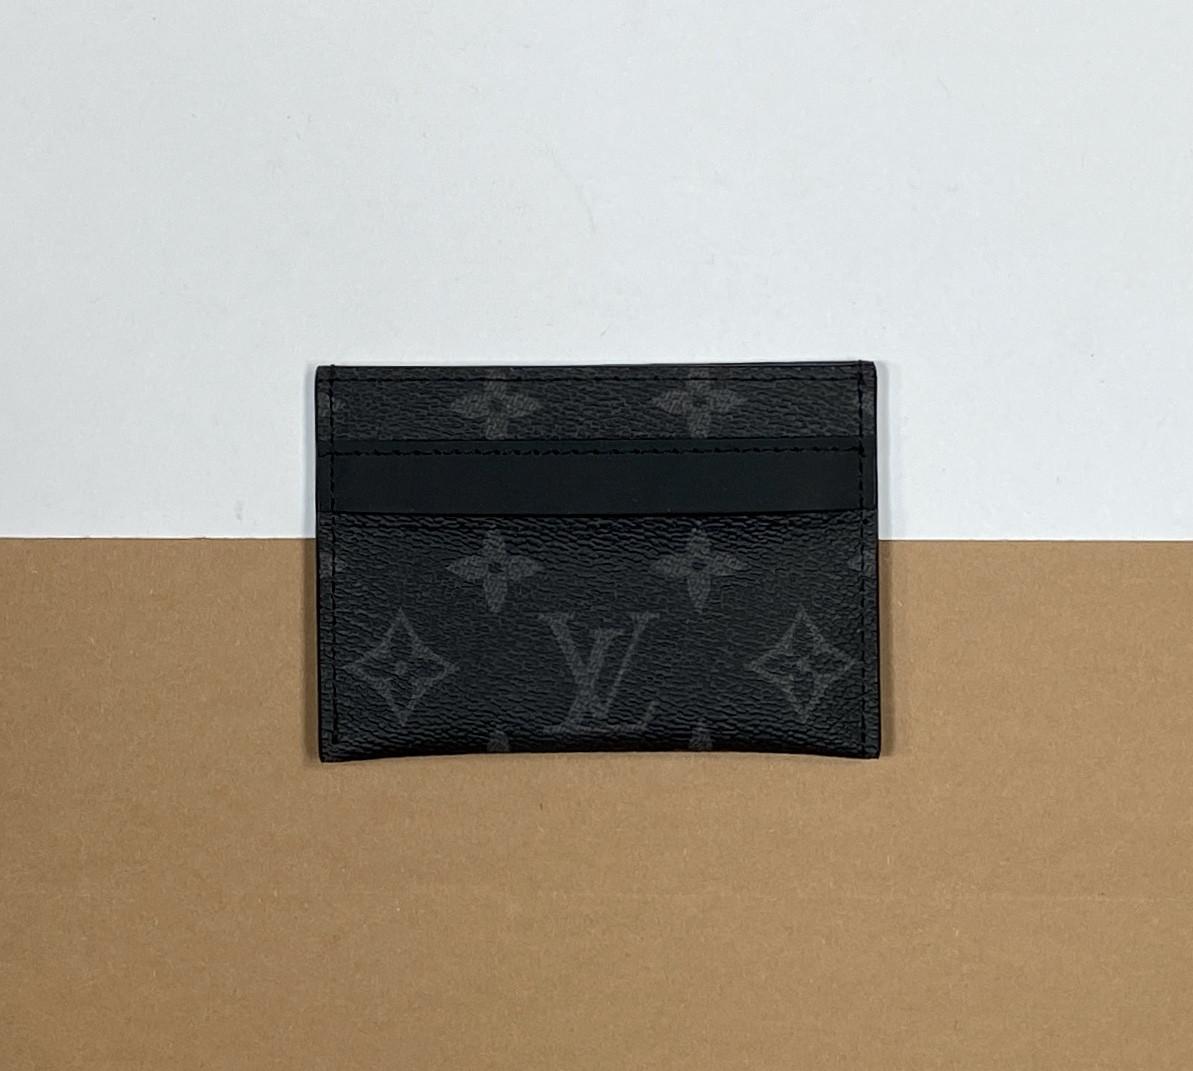 Мужской аксессуар Louis Vuitton